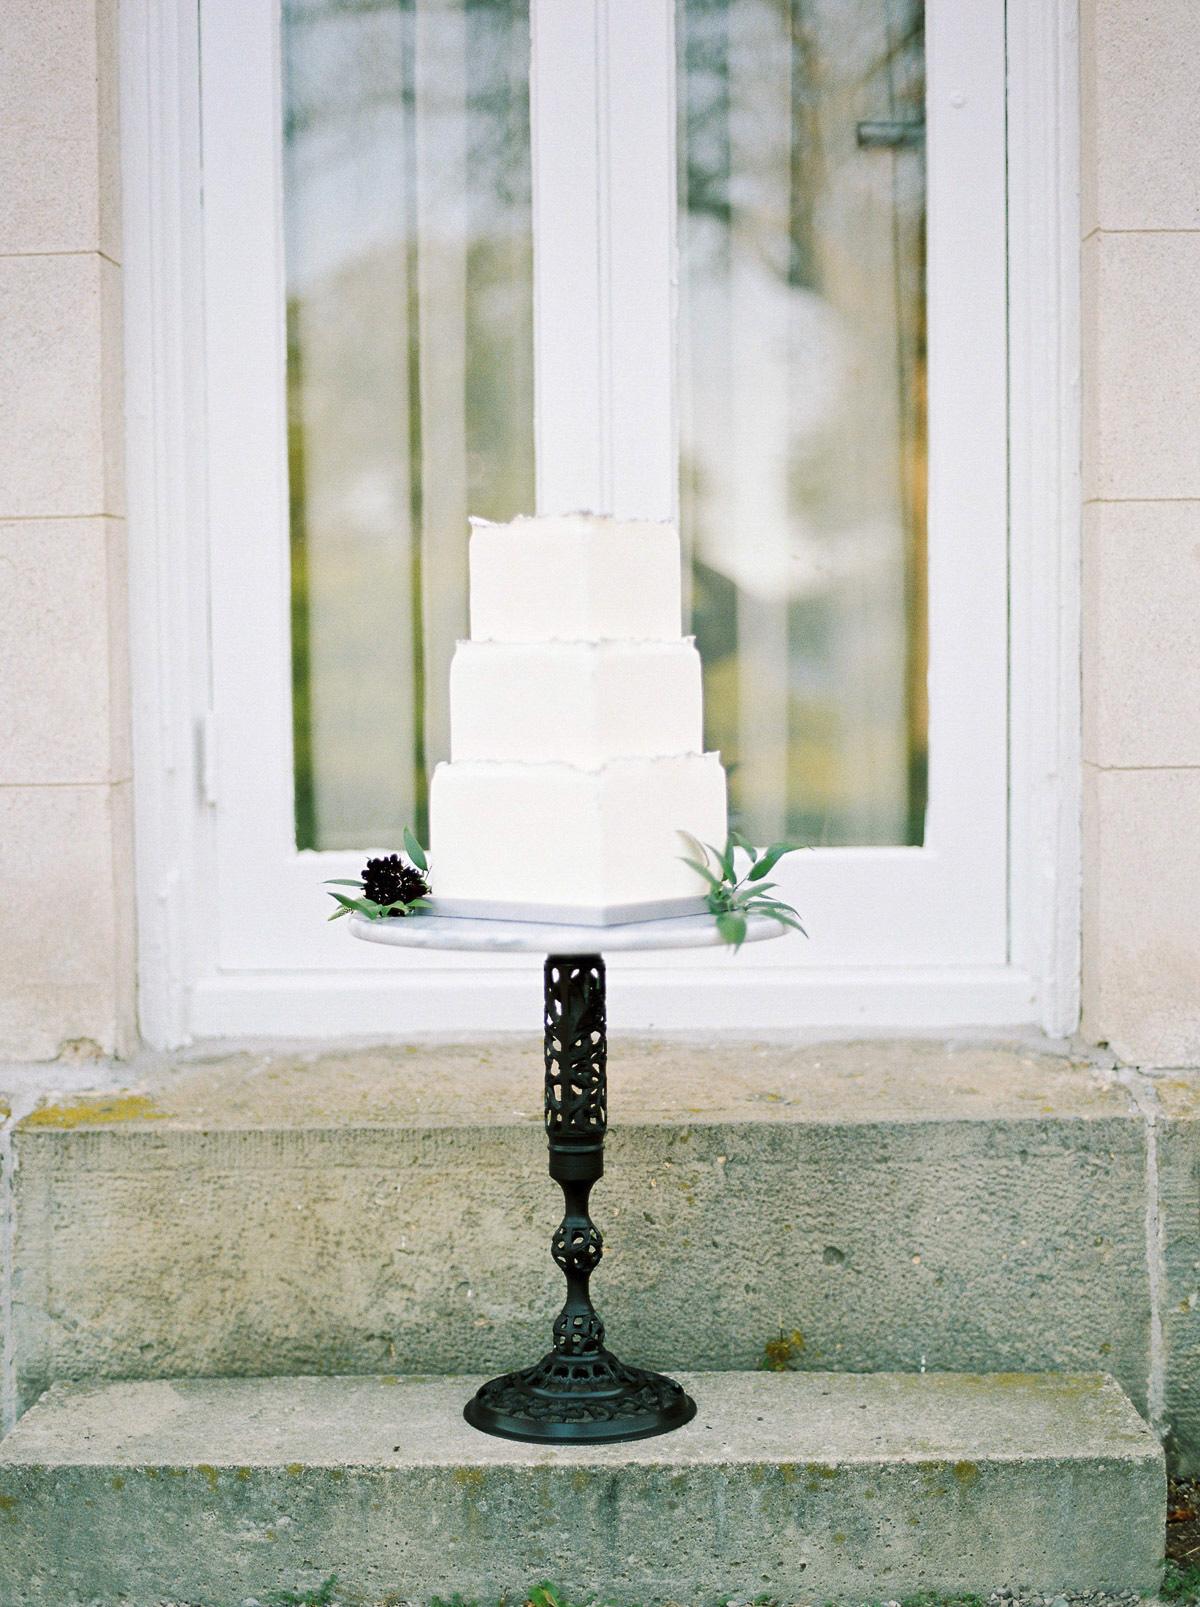 kurtz-orpia-photography-vineyard-bride-swish-list-dundurn-castle-dundas-wedding-editorial-10.jpg